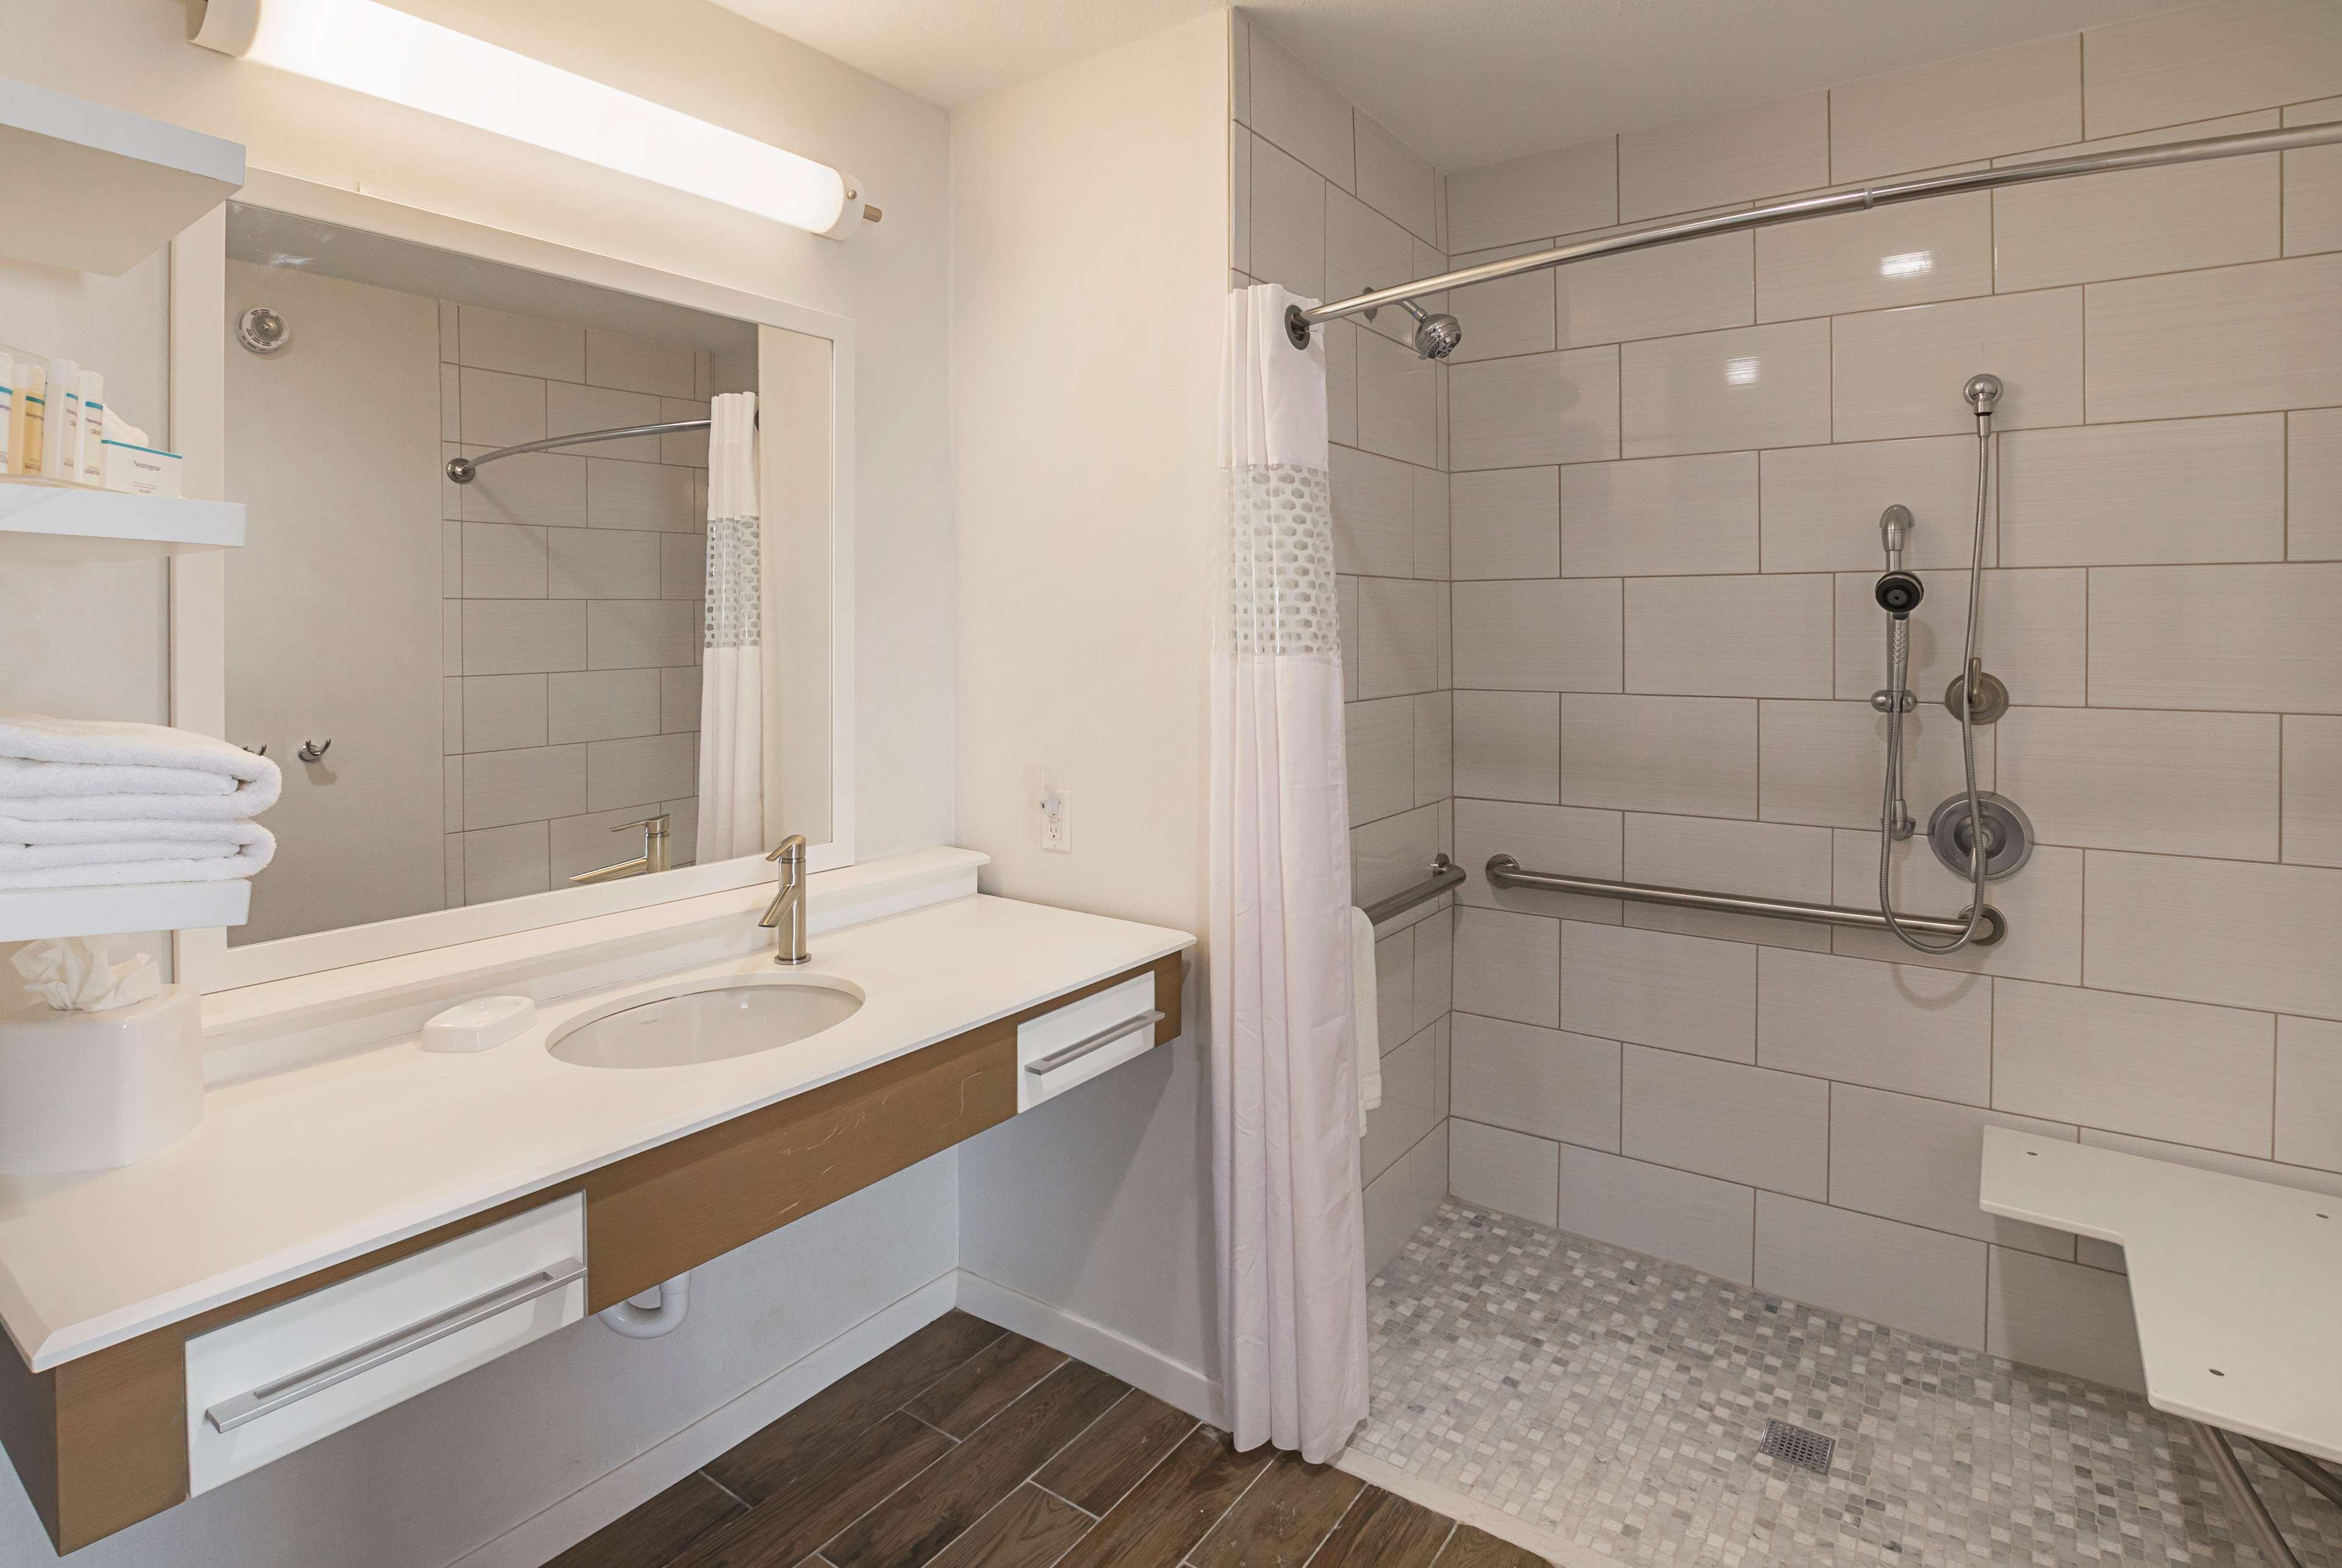 Hampton Inn & Suites Colleyville DFW West image 23